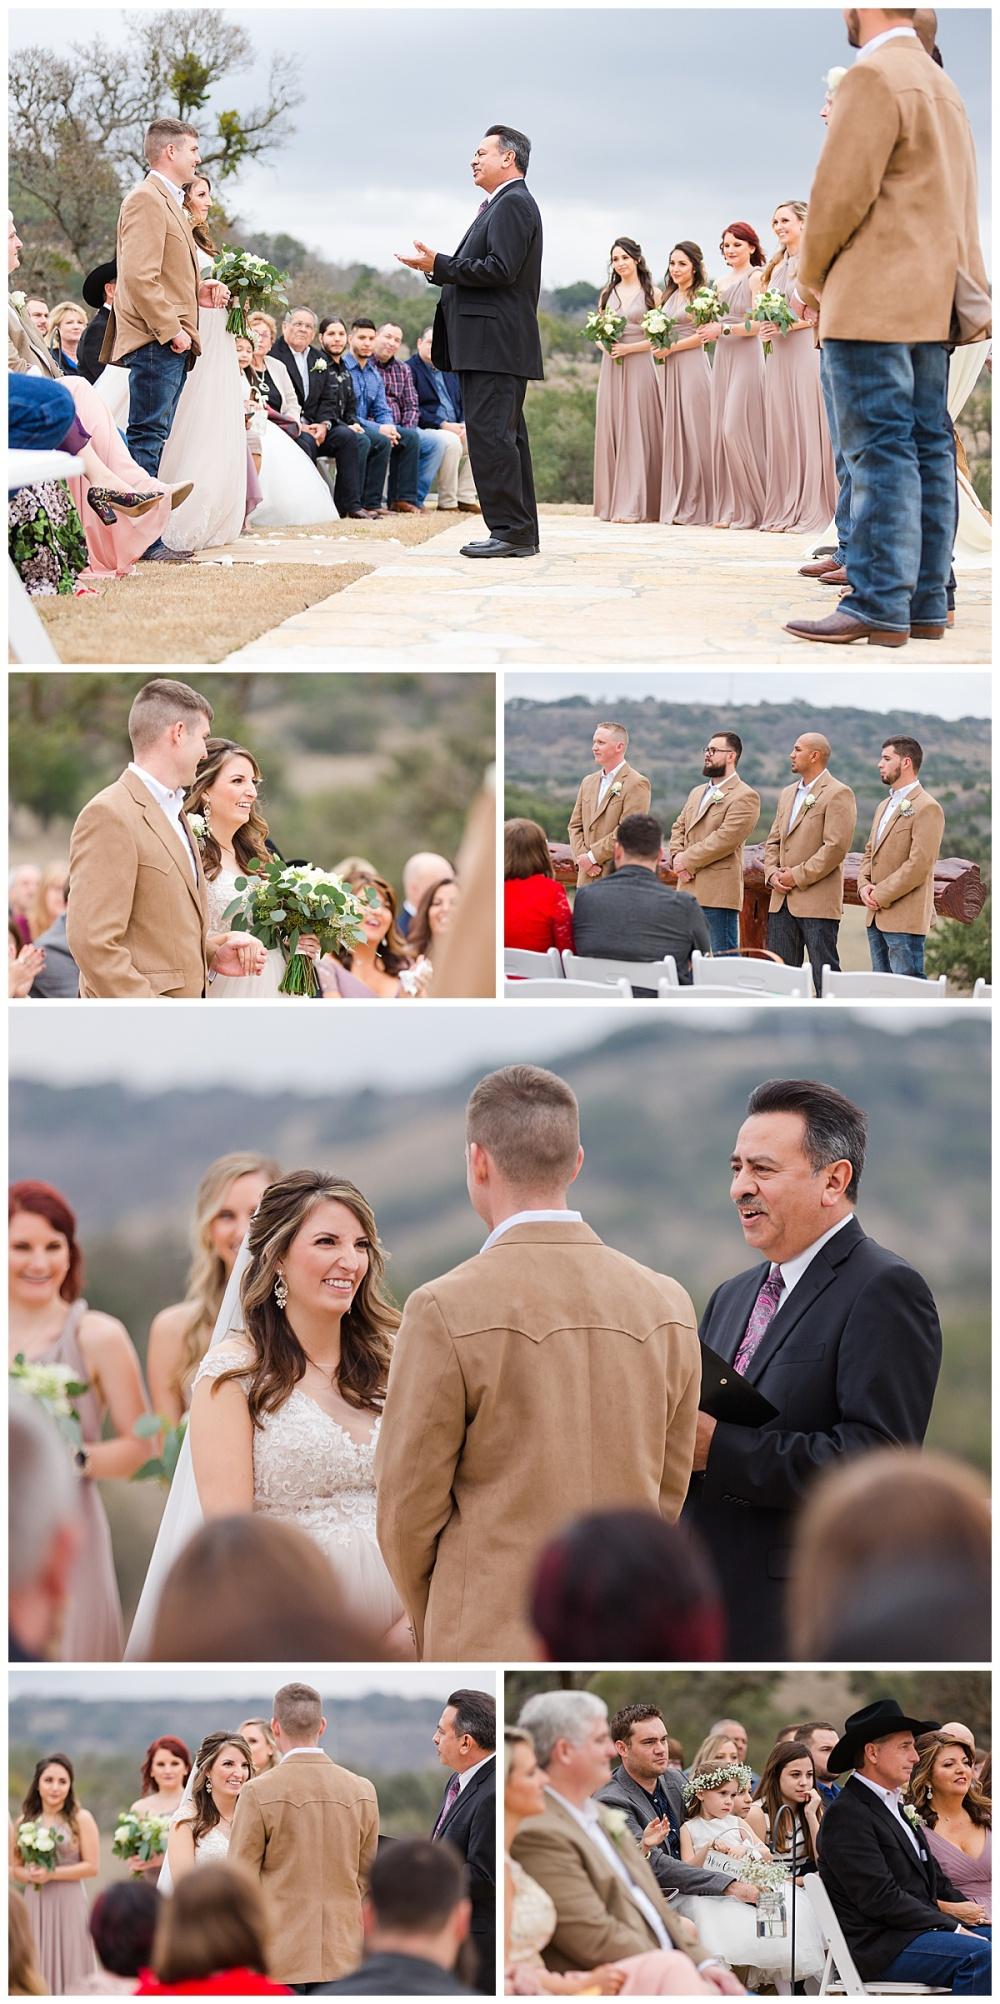 Wedding-Photographer-Texas-Hill-Country-Happy-H-Ranch-Comfor-Texas-Carly-Barton-Photography_0022.jpg